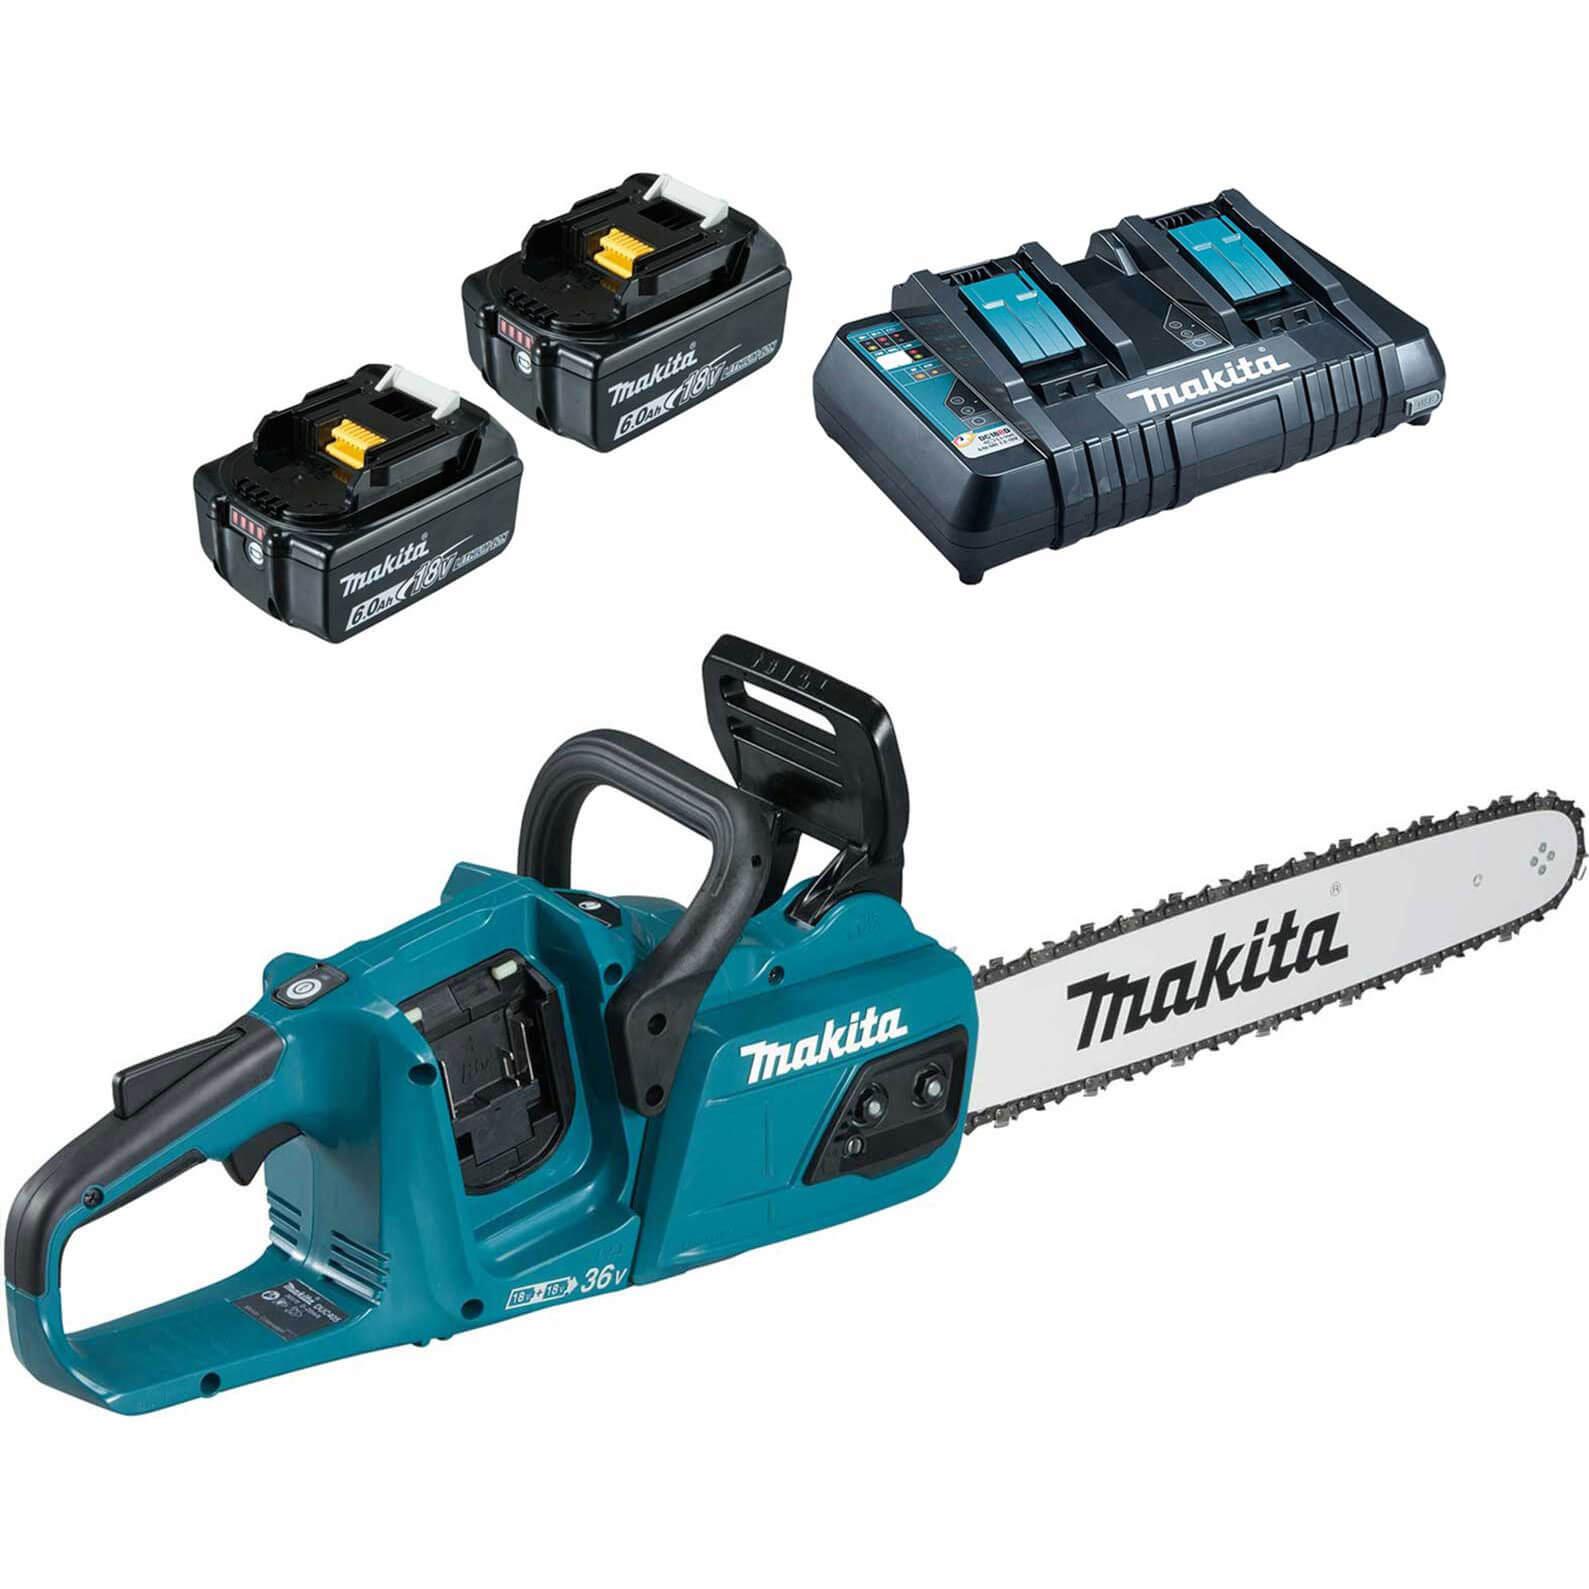 Makita DUC355 18V LXT Brushless Chainsaw 350mm 2 x 6ah Li-ion Charger